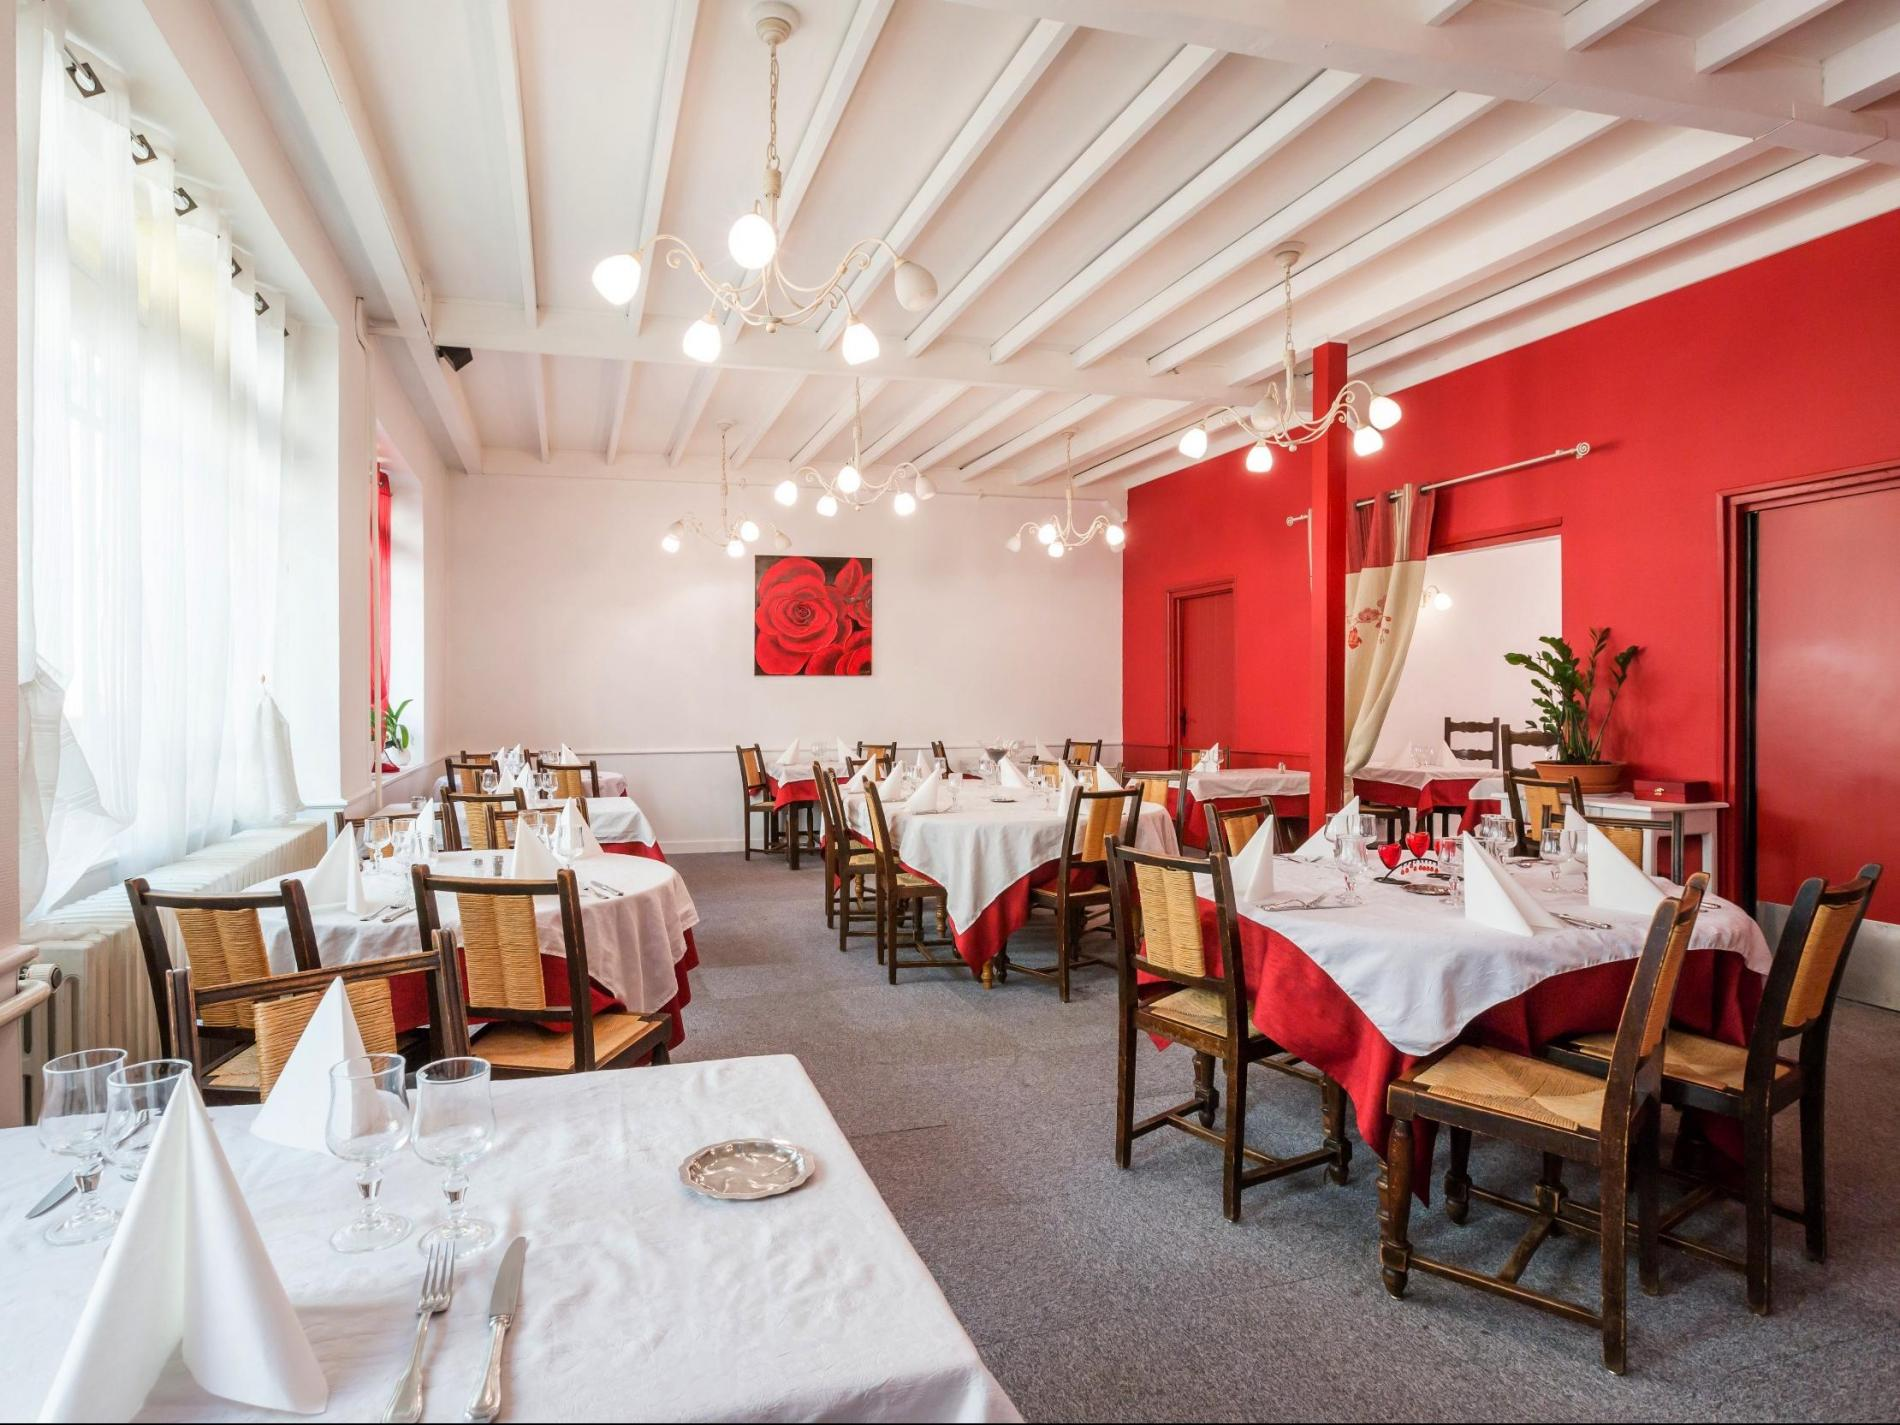 Hotel Restaurant Le Cygnz Yssingeaux